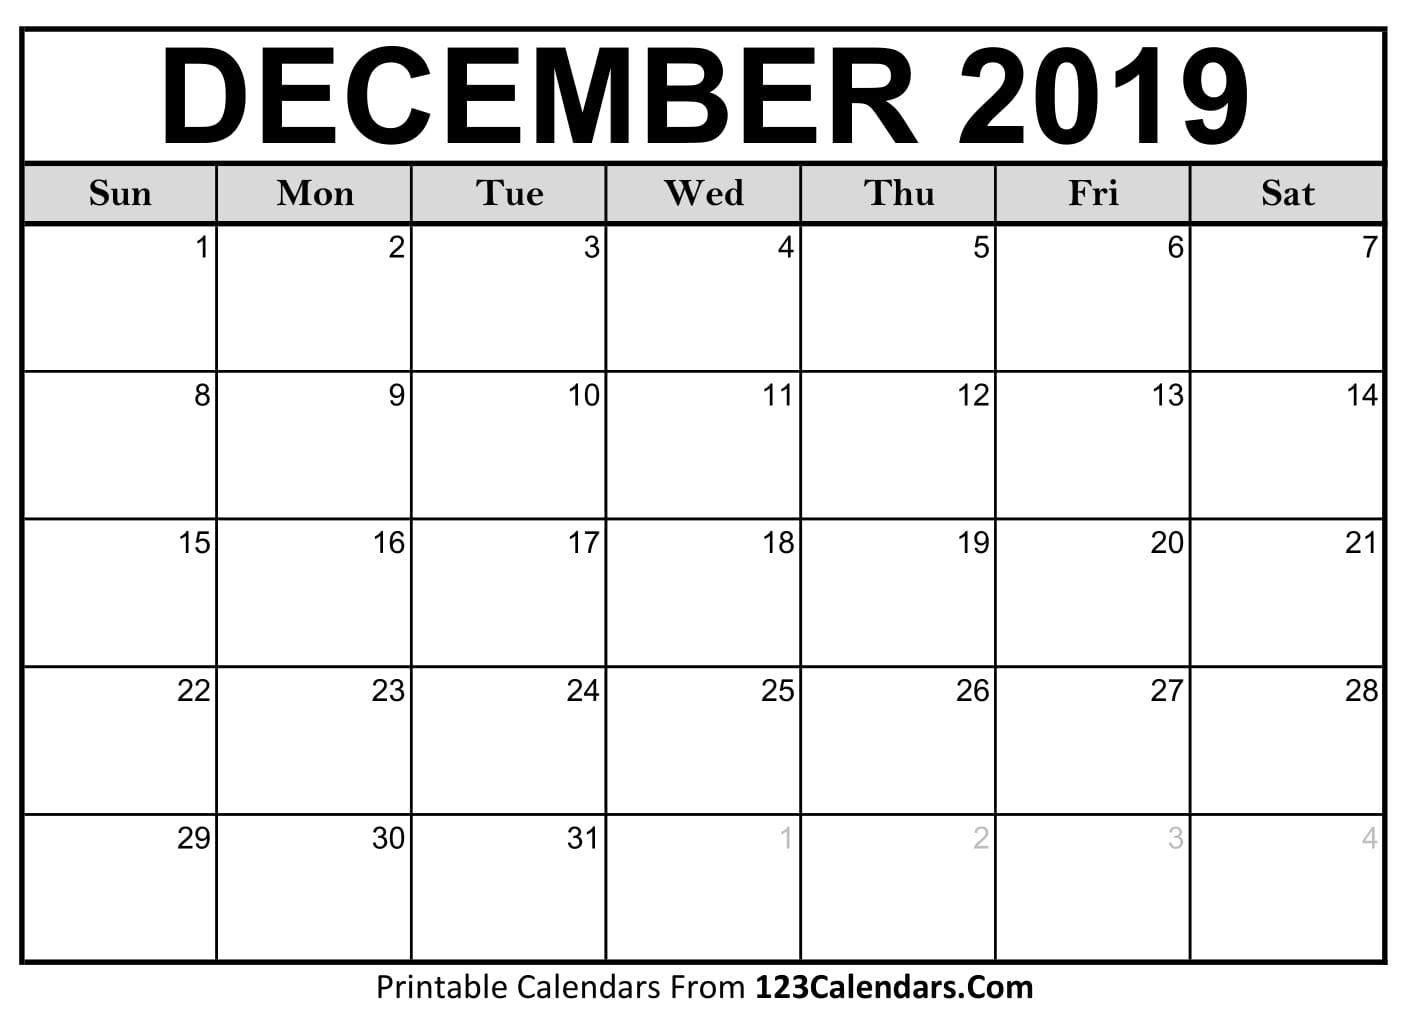 December 2019 Printable Calendar | 123Calendars pertaining to Blank December Calendar Printable